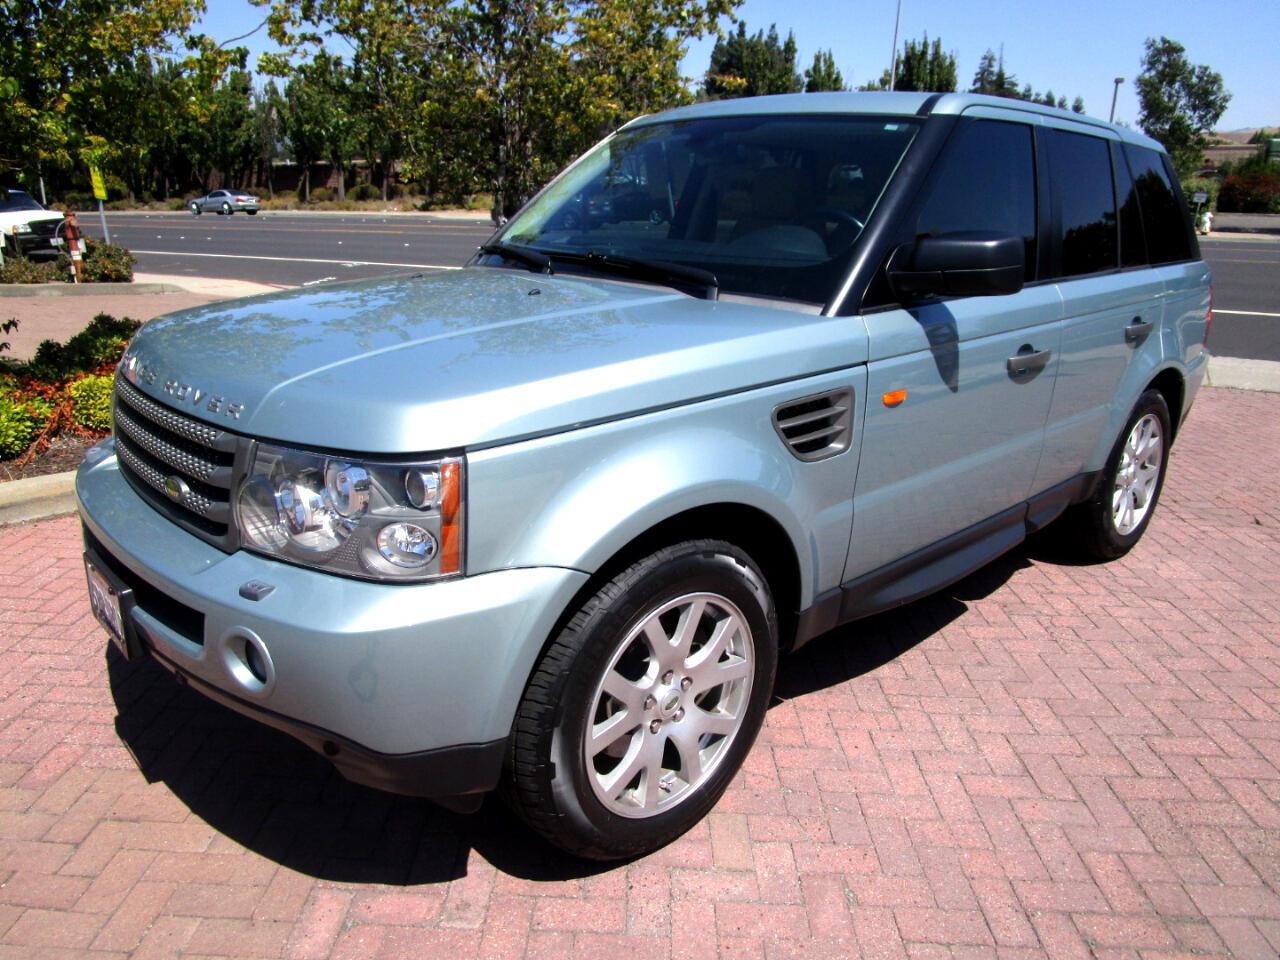 2008 Land Rover Range Rover Sport HSE AWD**NAV*HK SOUND/SAT RADIO**F/R HEAT SEATS**